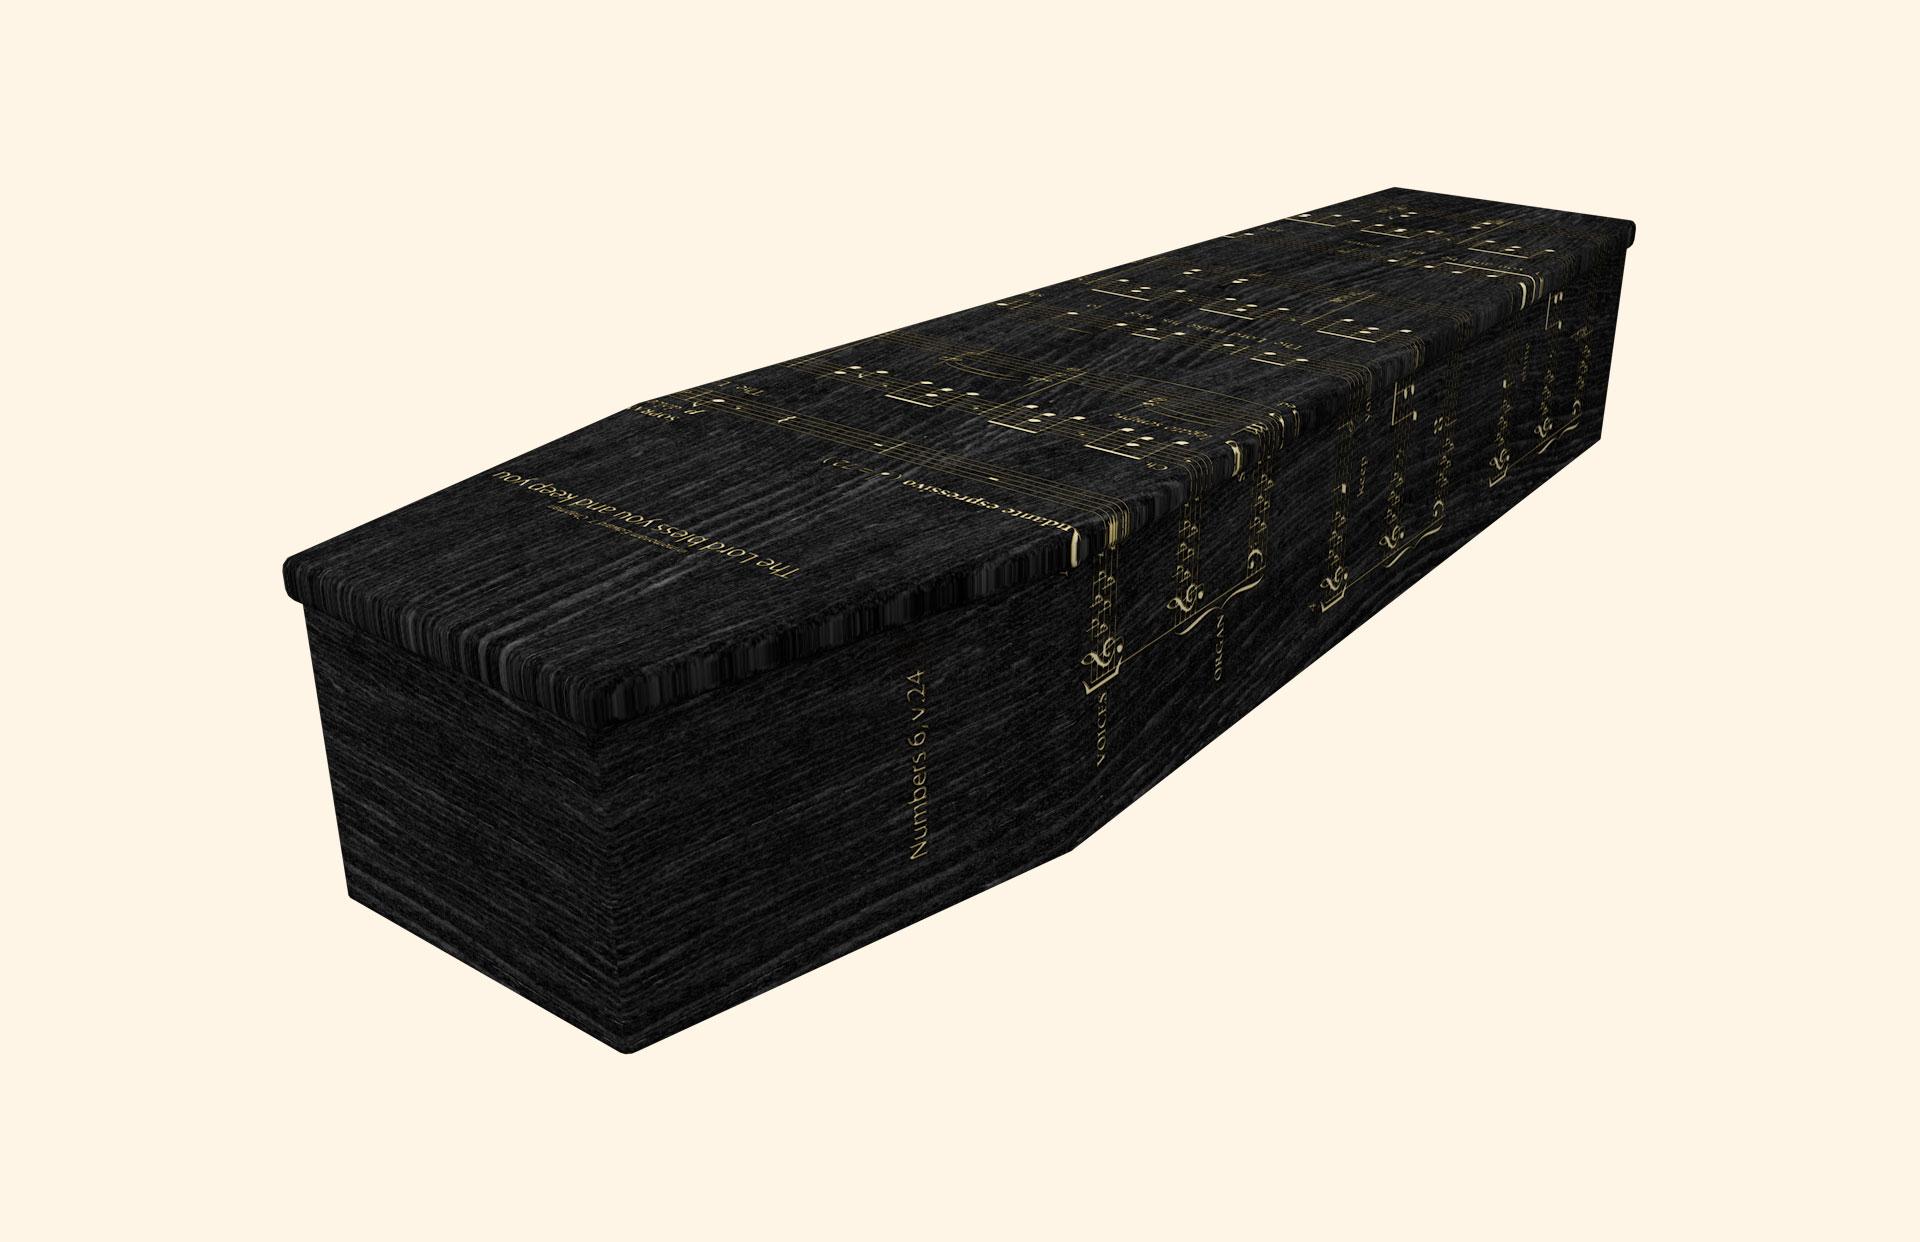 Lord Bless You Black Oak Cardboard coffin